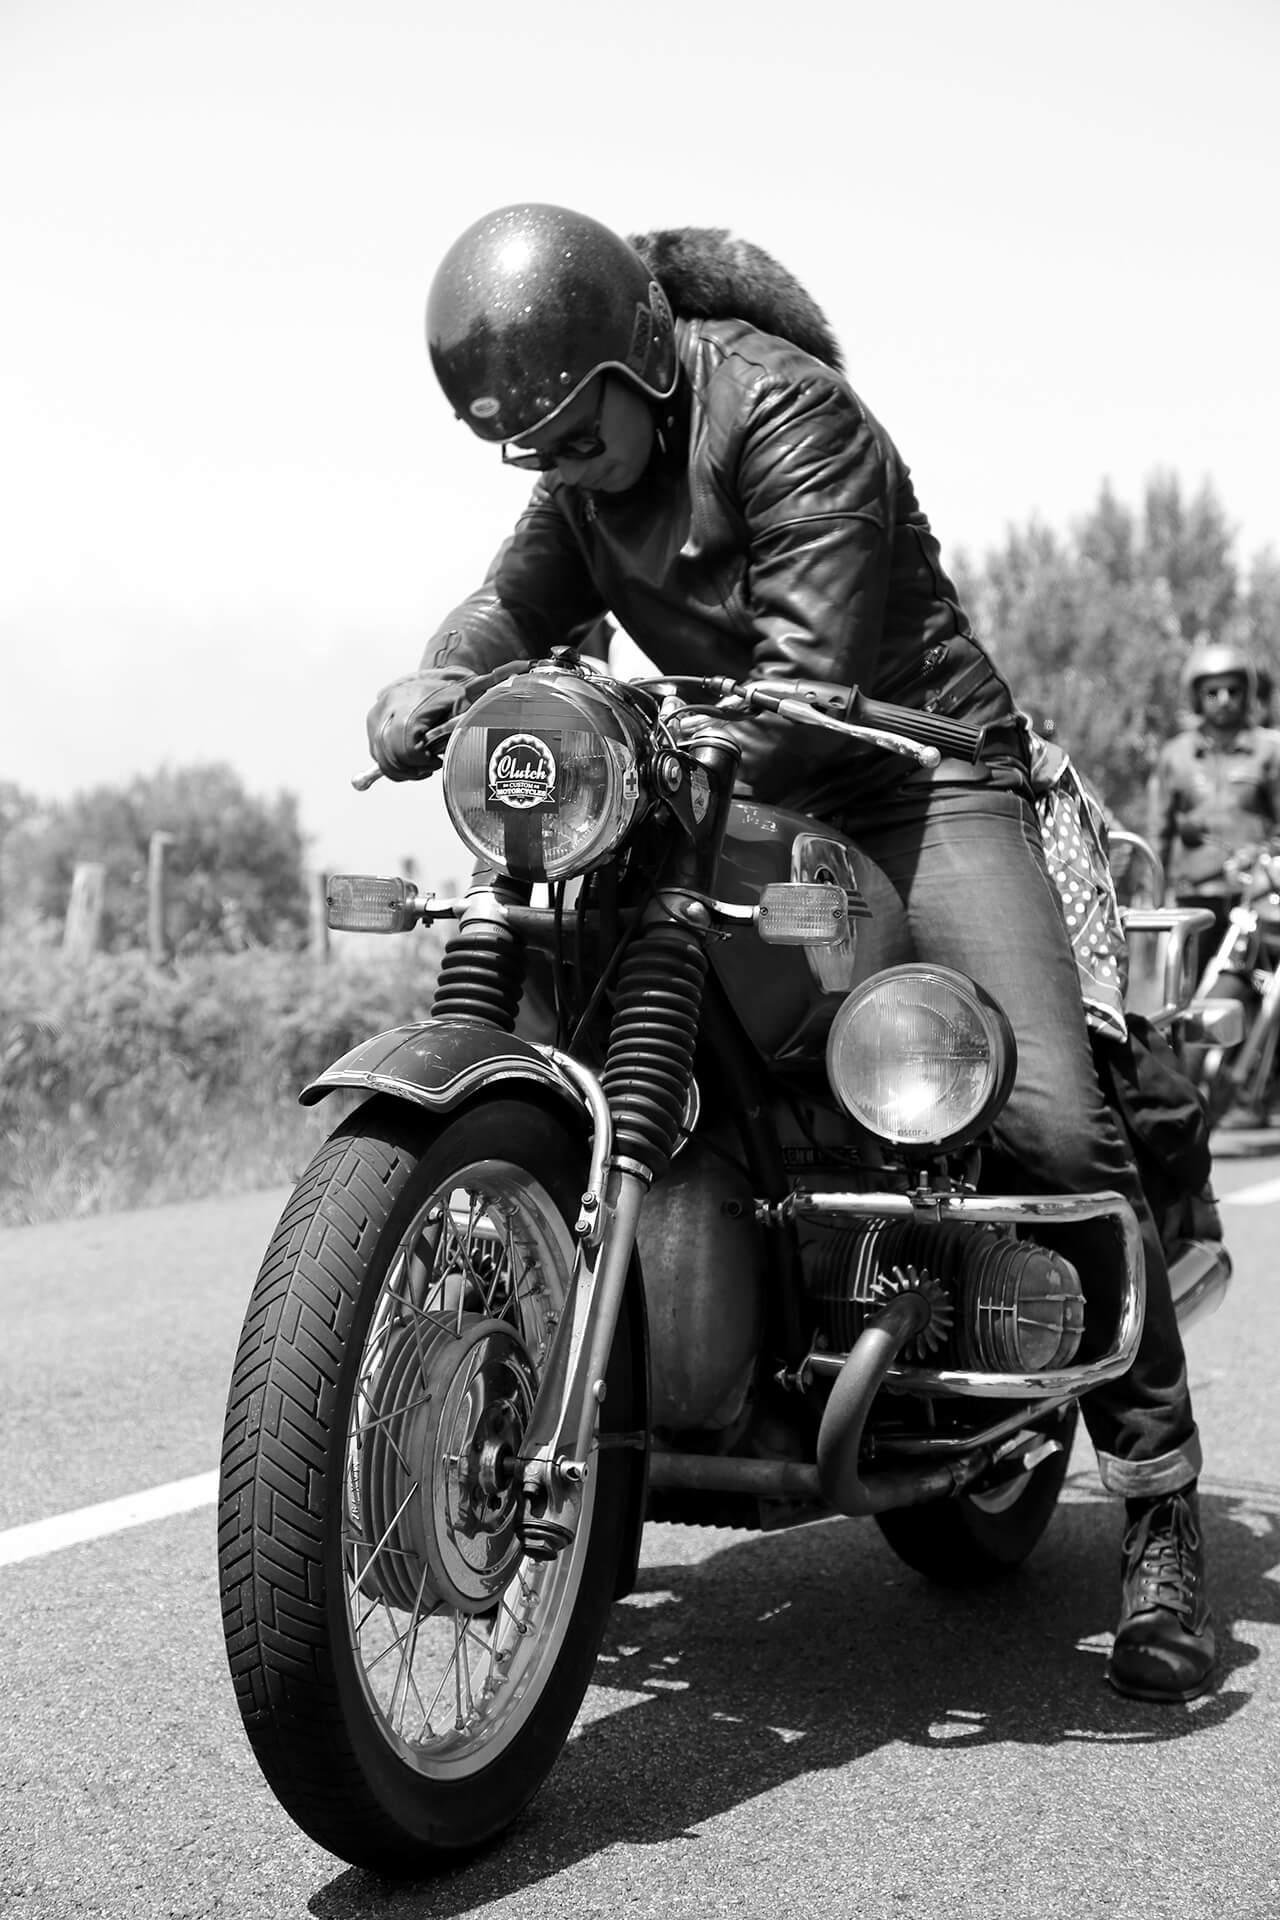 Wheels, Waves, Wheels and Waves, fashion, helmet, sparkle, biker, motorcycle, bike, france, film, photography, event, WeAreShuffle, gentleman